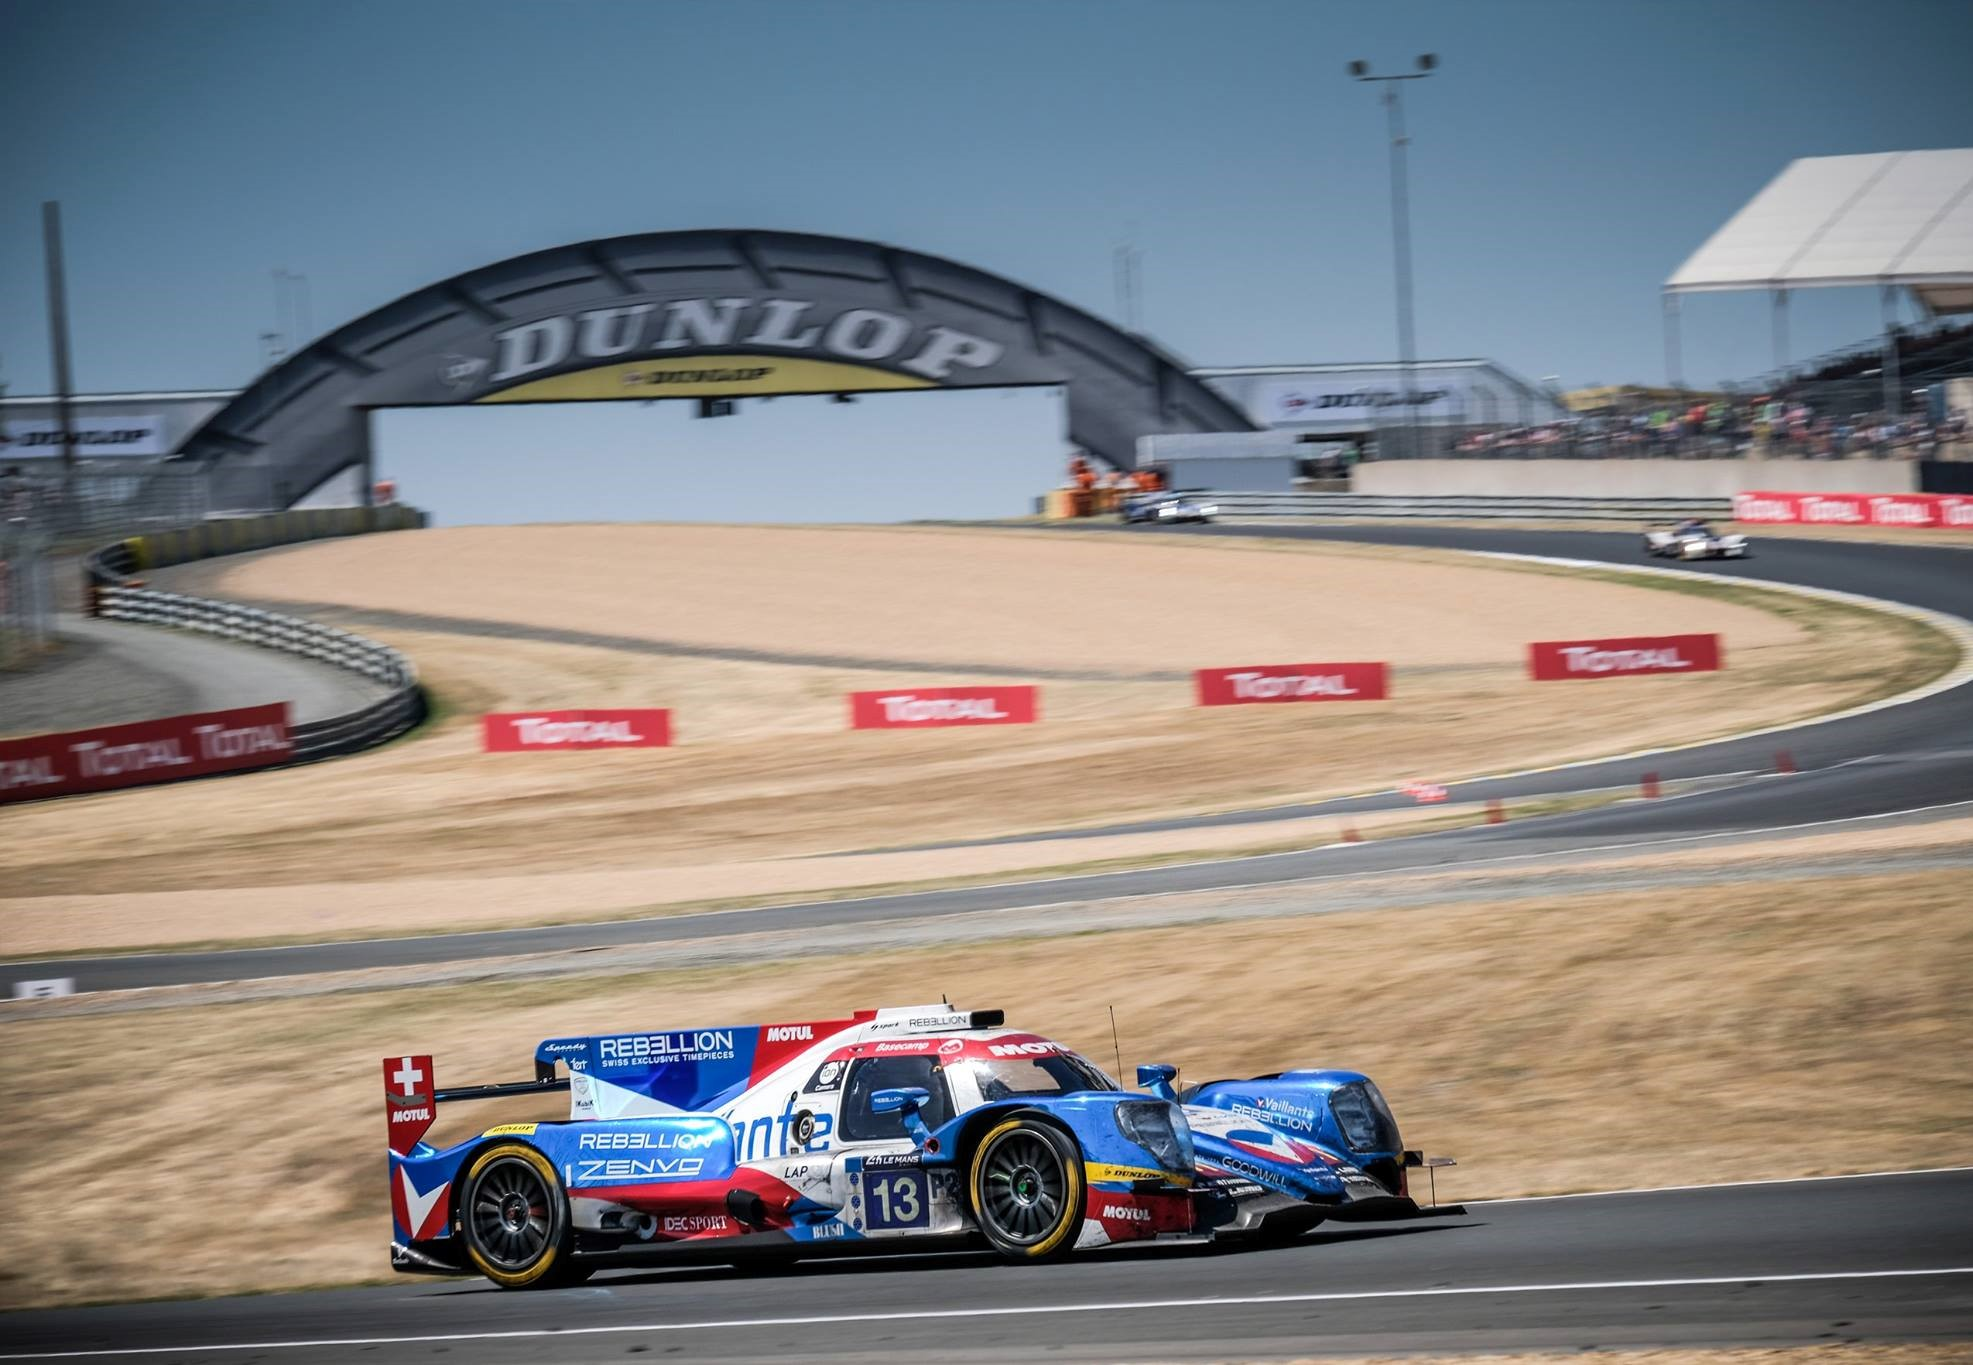 © AutoWebbb Motorsport - Eric Fabre